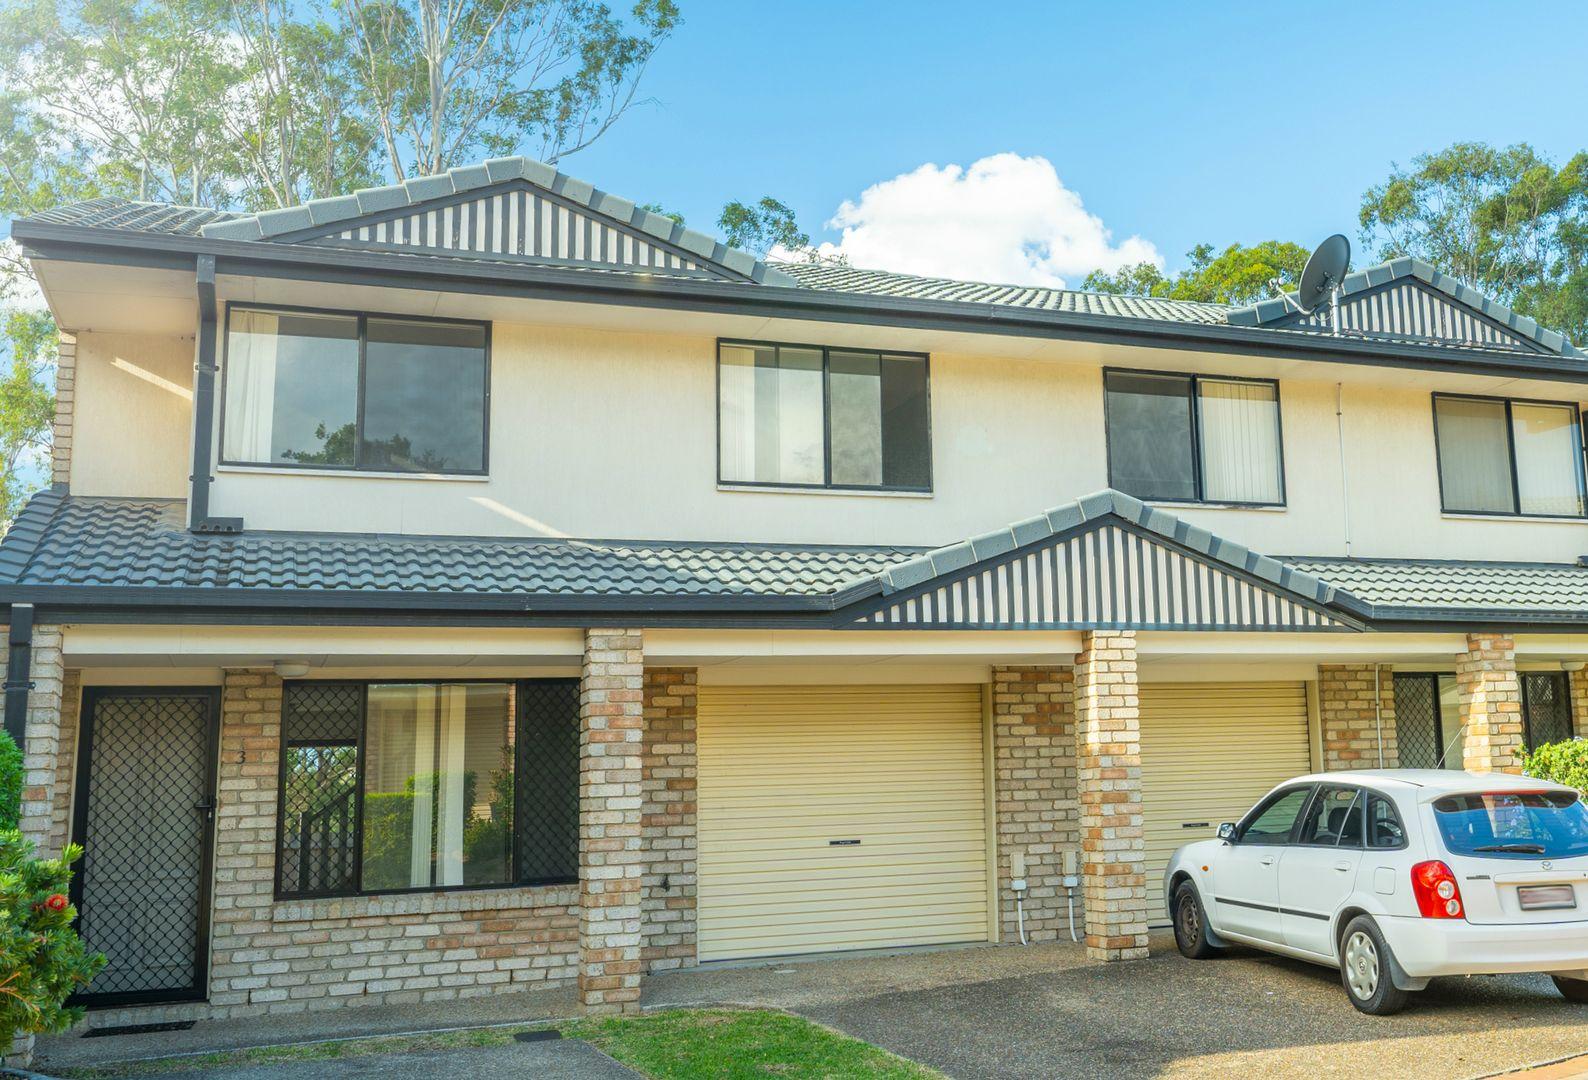 3/50 Endeavour Street, Mount Ommaney QLD 4074, Image 0